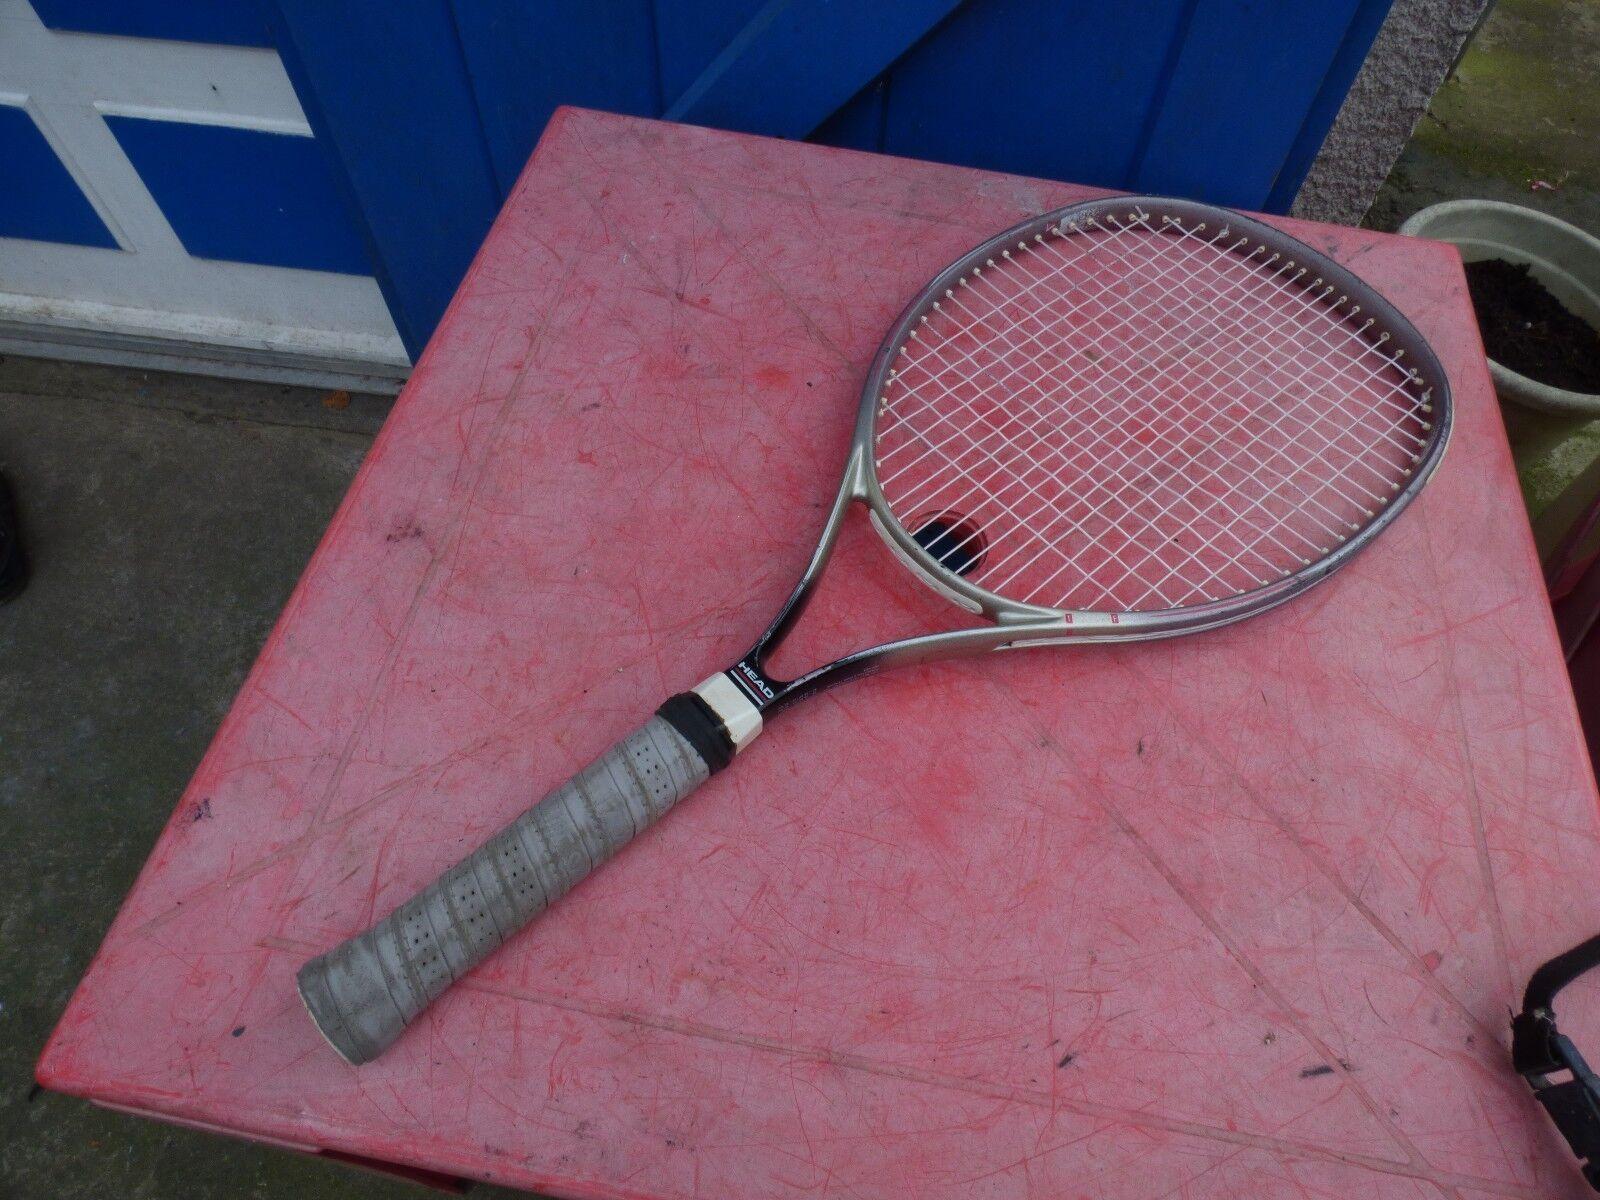 Raquette de tennis vintage Head Elite Director Test rarissime